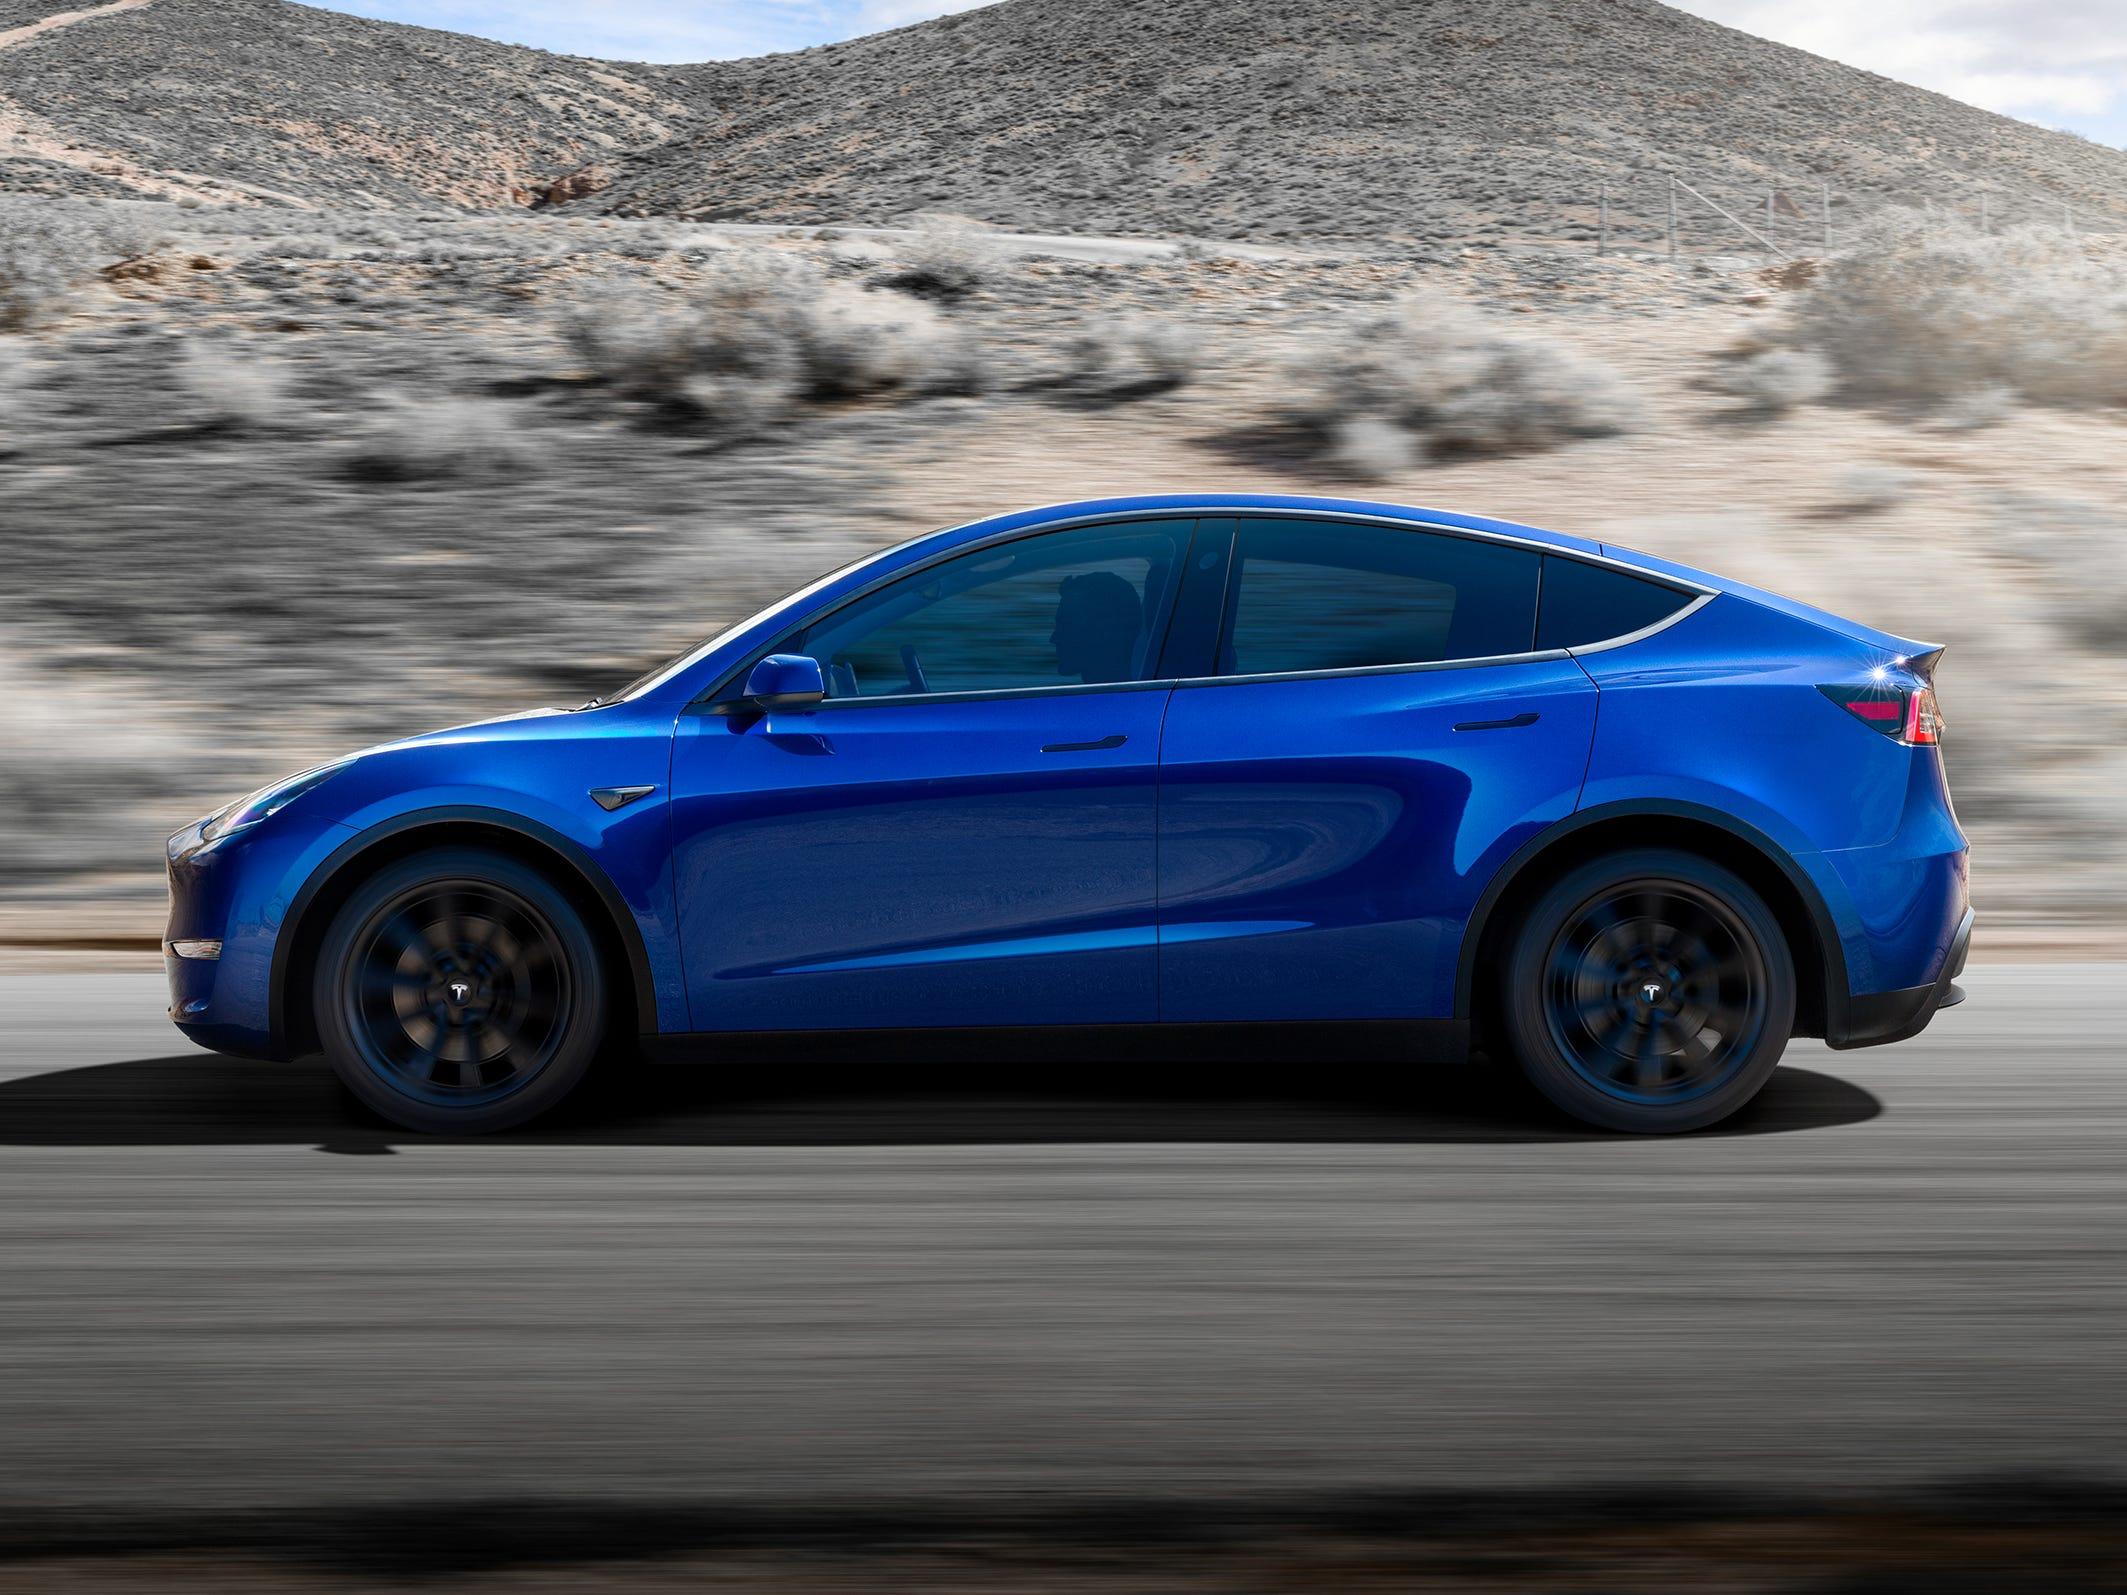 Tesla claims the Tesla Model Y ute has the same drag coefficient - 0.23 - as the Model 3 sedan.